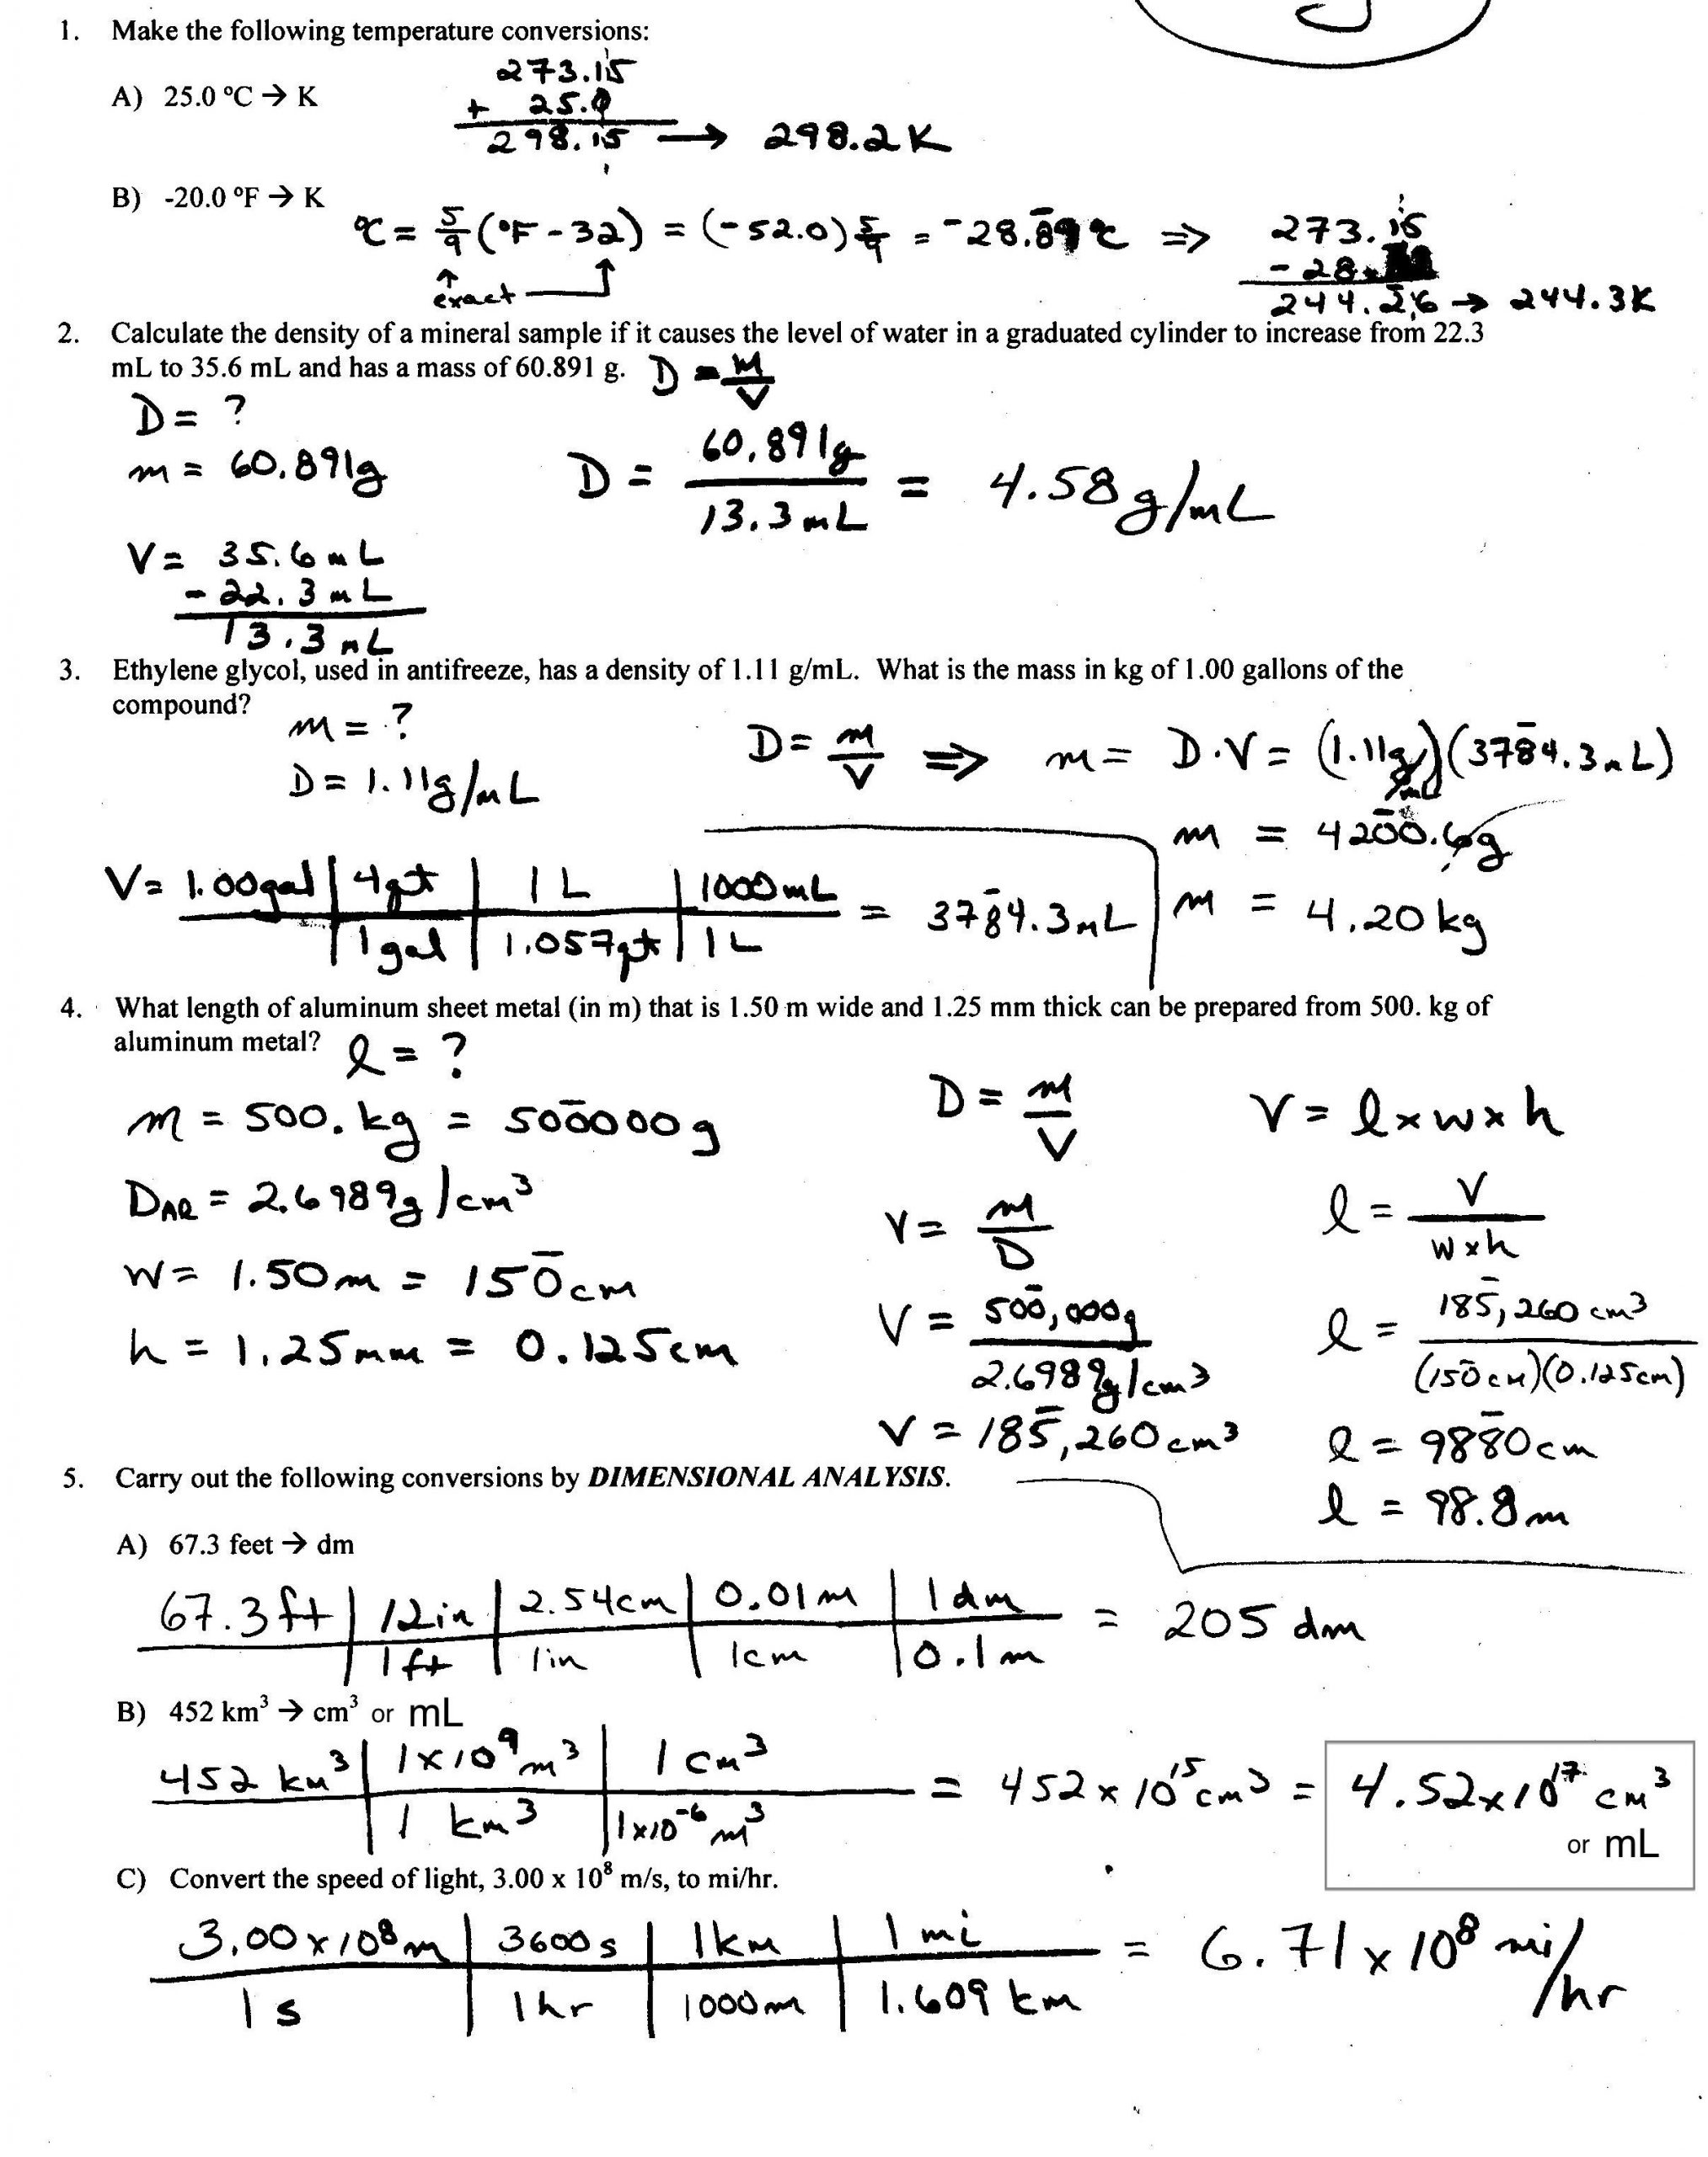 Dimensional Analysis Practice Worksheet Density Worksheet with Answers Calculate Density Worksheet